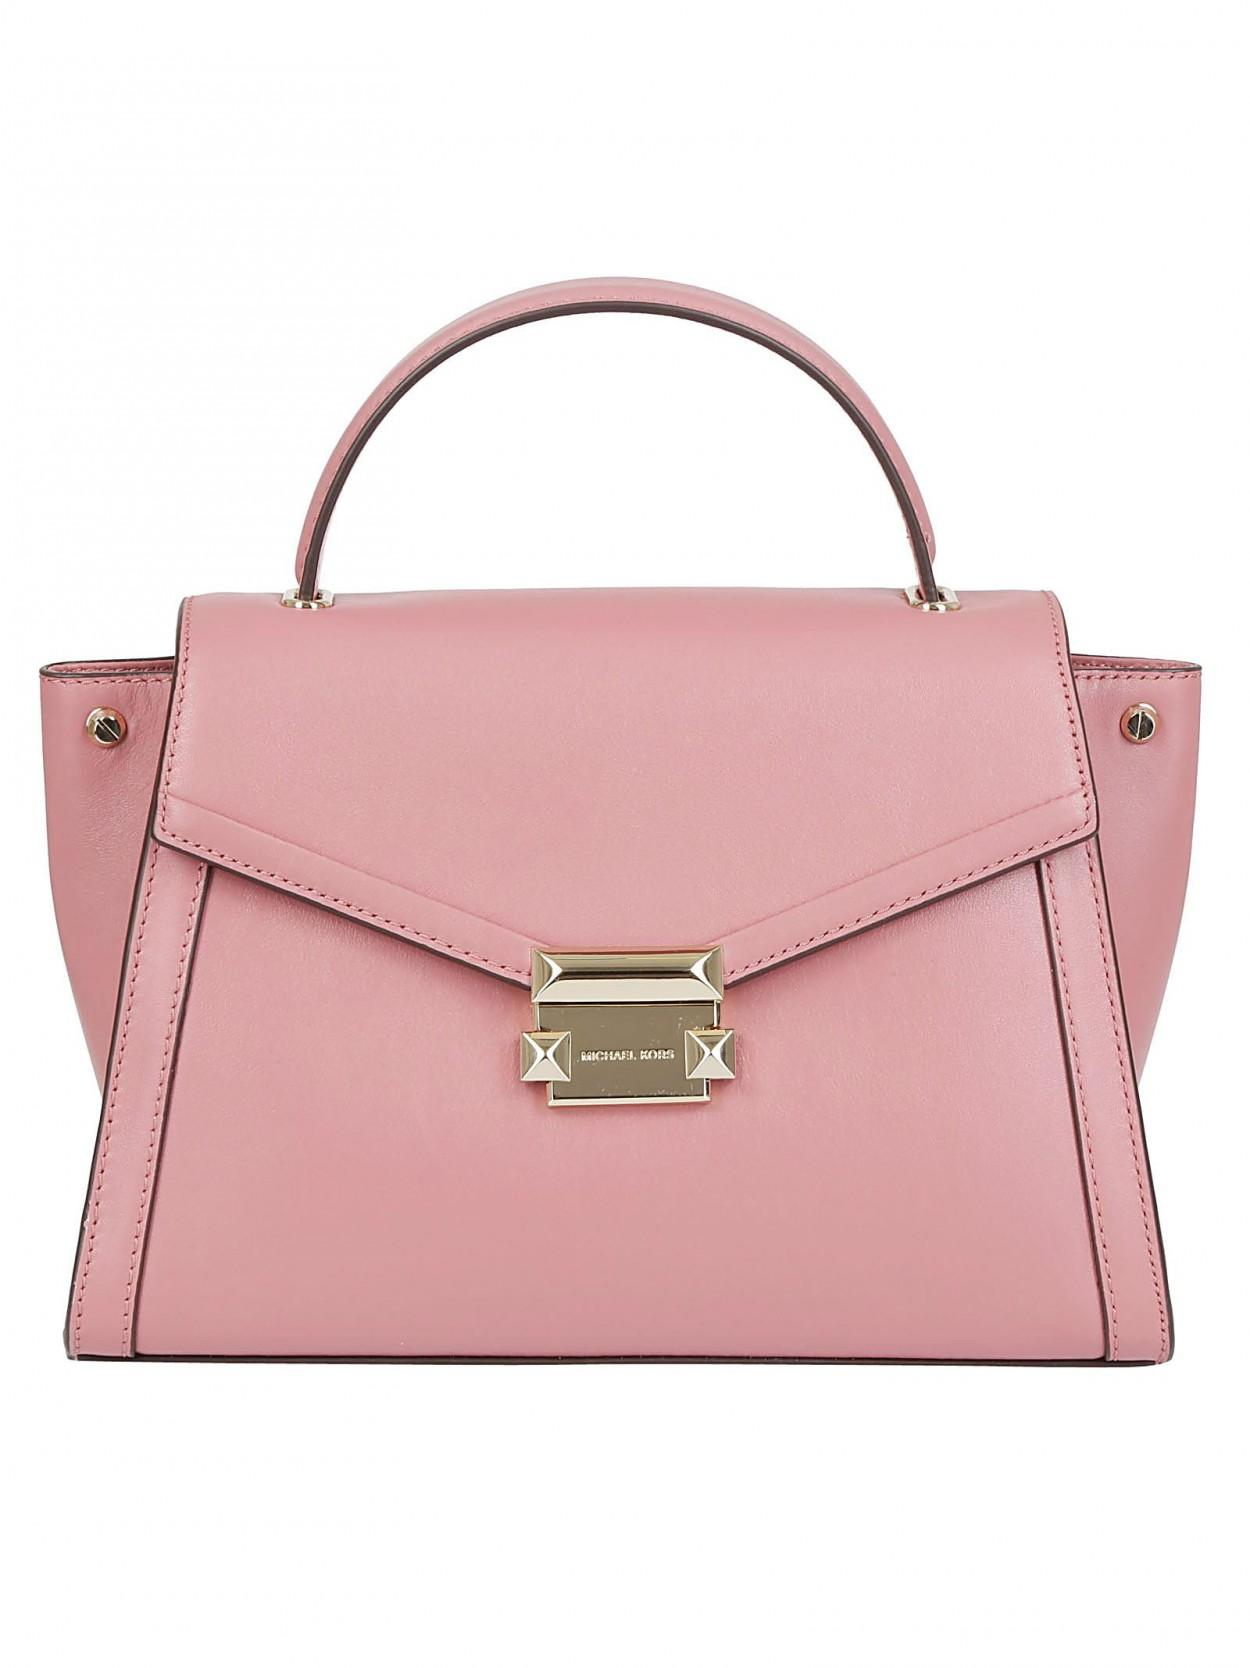 266fc46c8f3d Michael Kors MICHAEL KORS borsa a mano rosa antico in Pink - Lyst